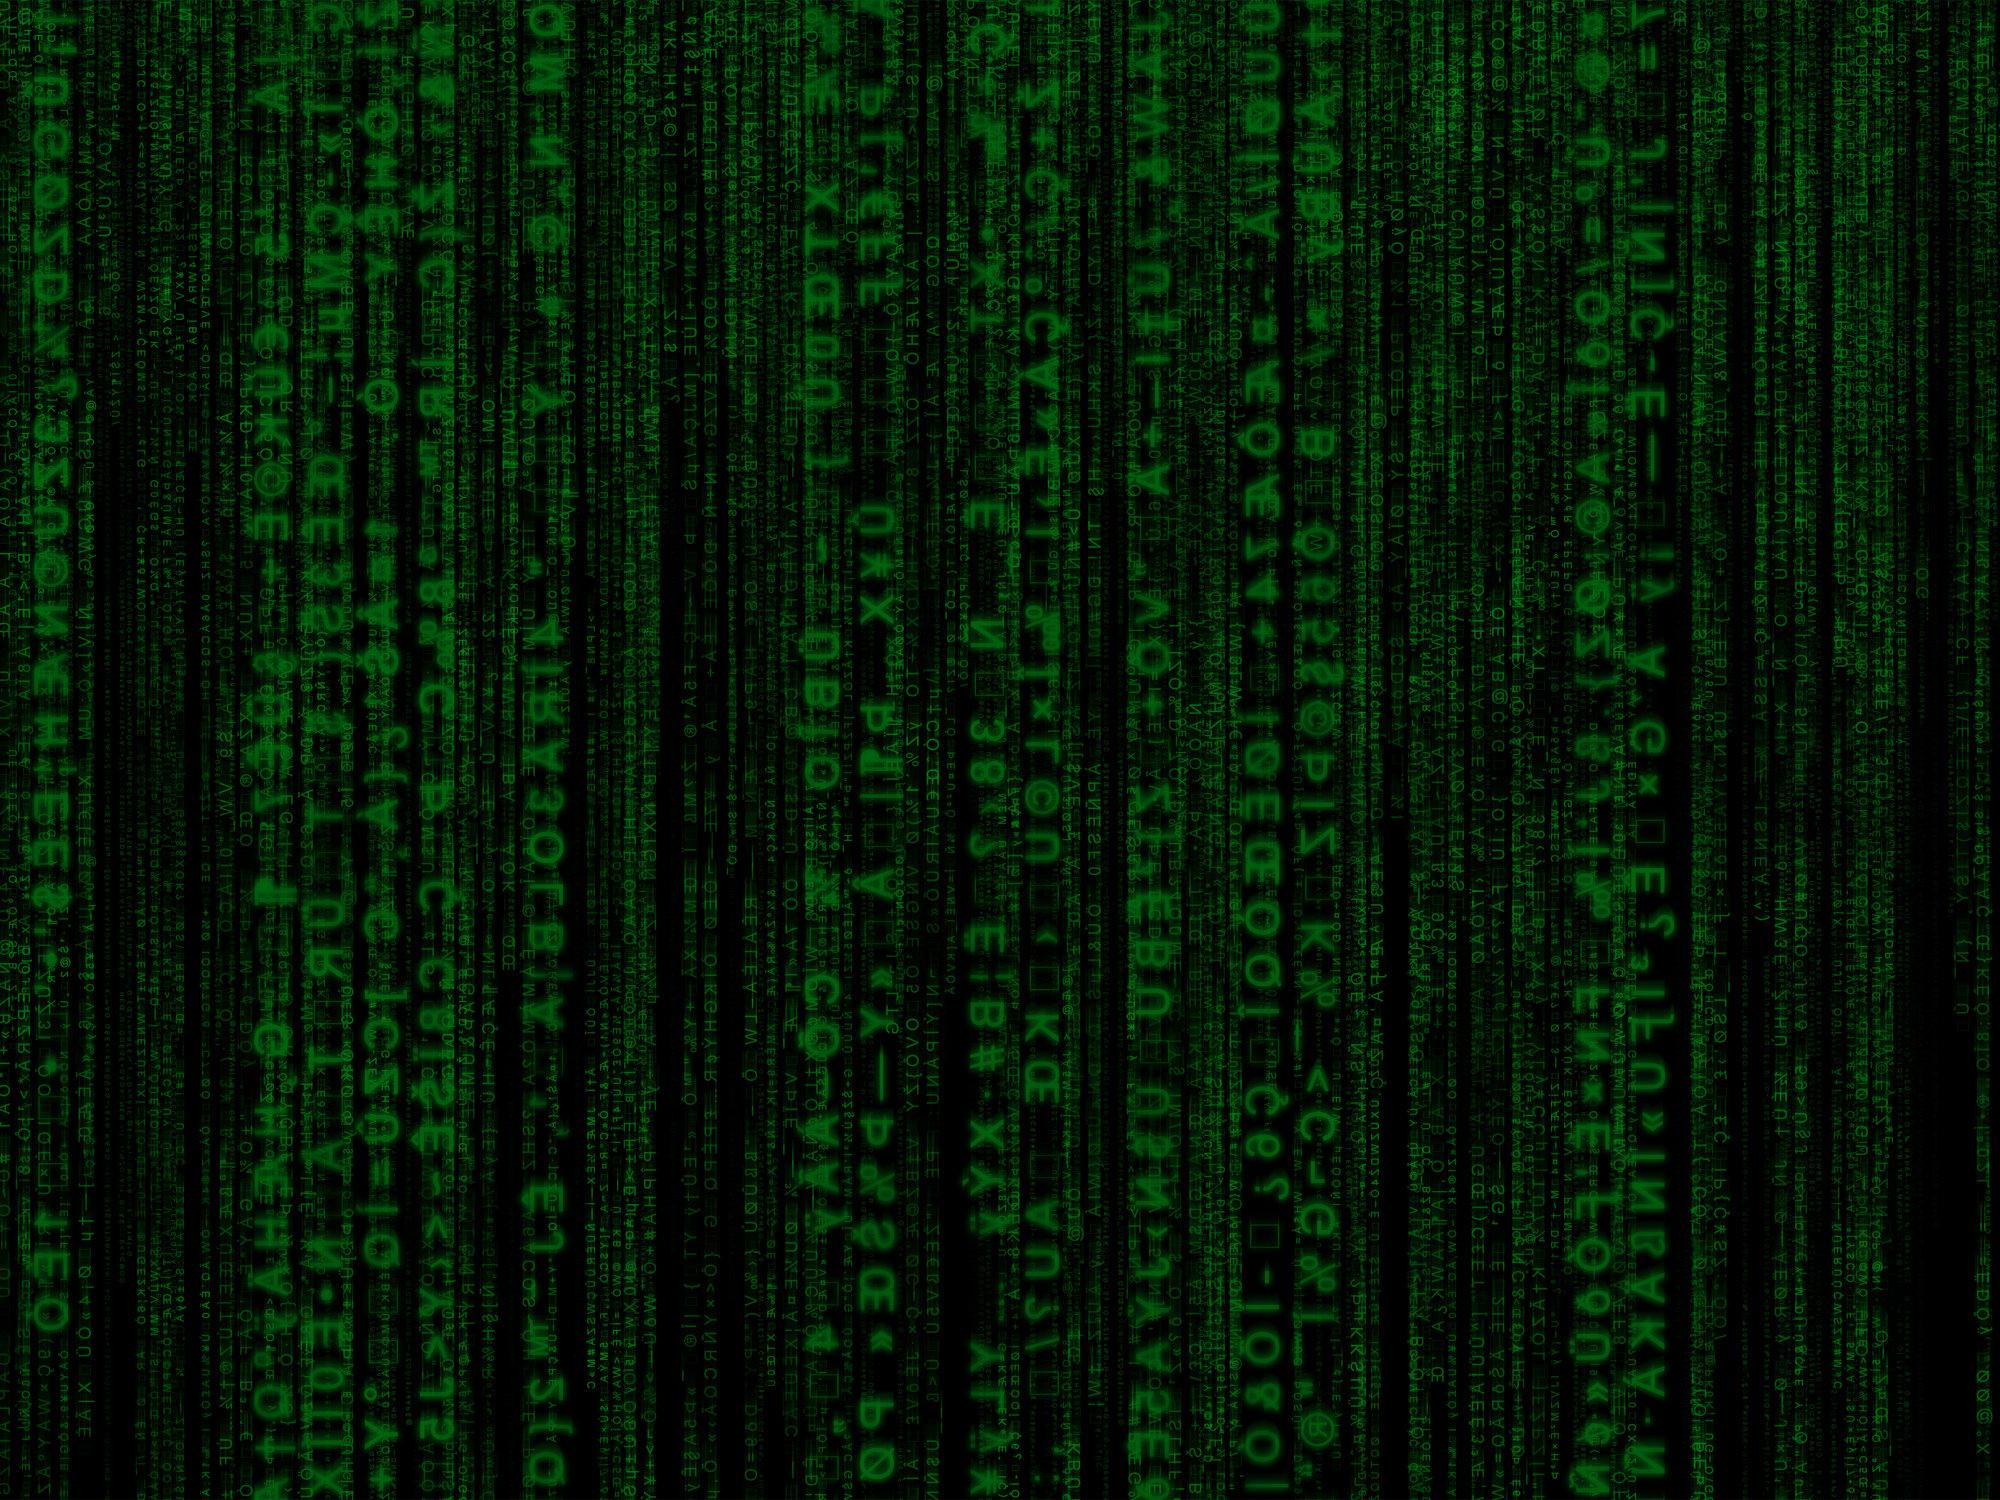 Matrix Code Wallpaper by Big Bohn 2000x1500